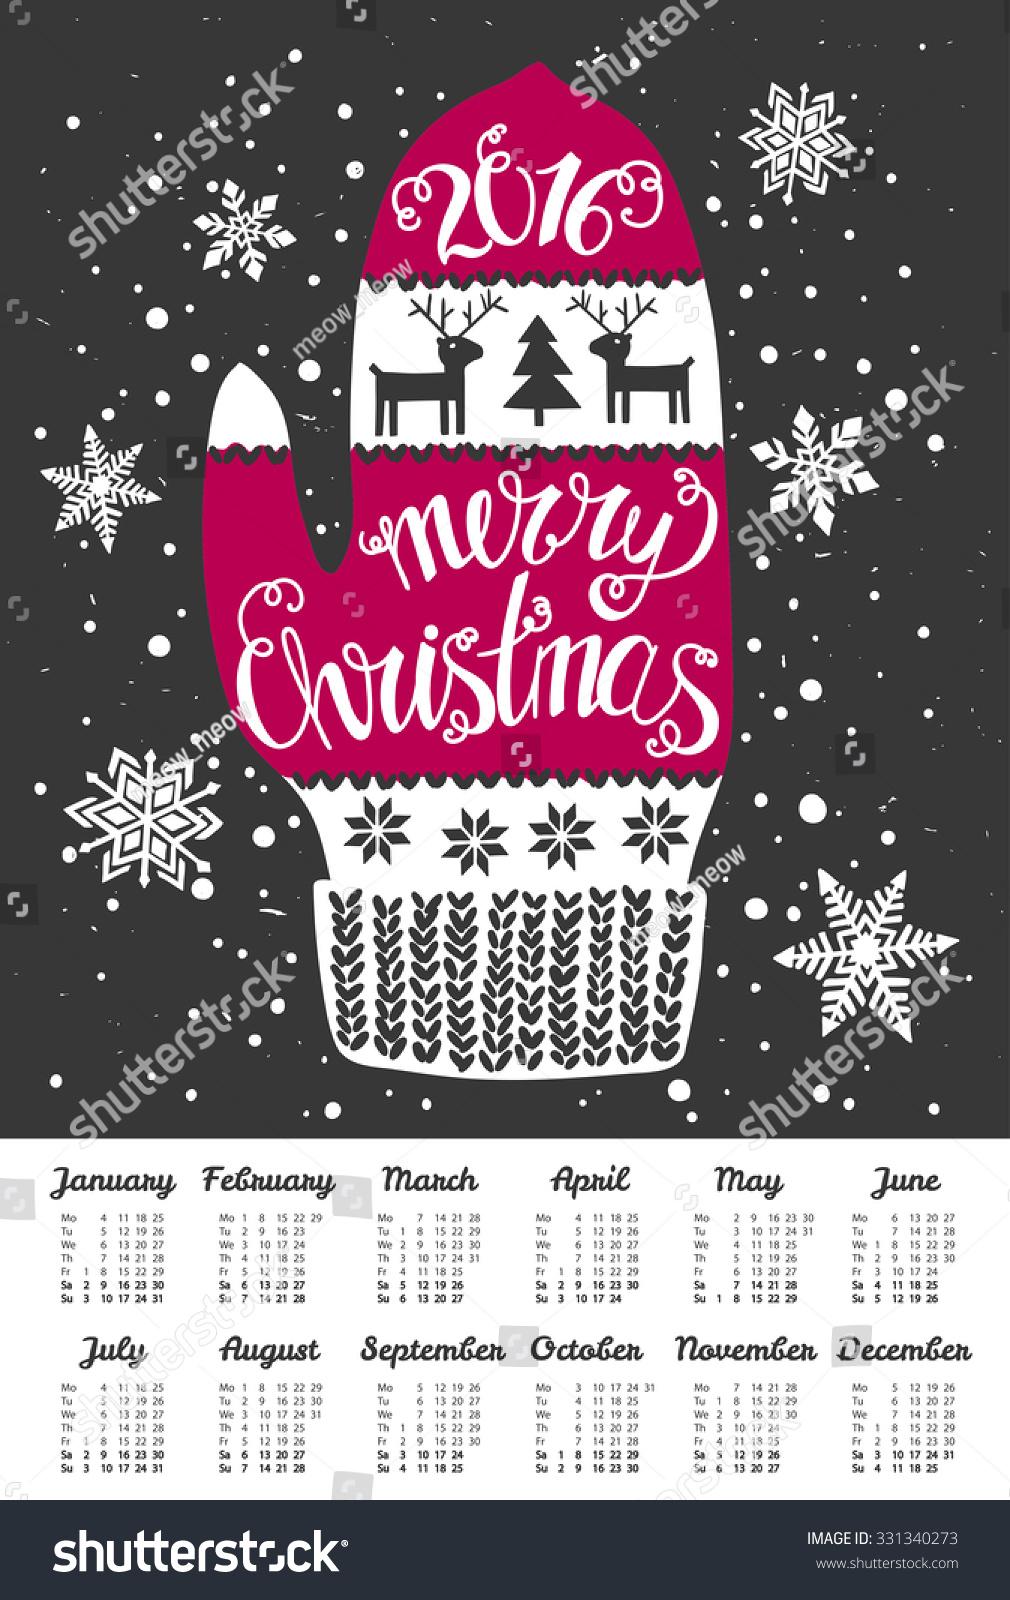 Merry Christmas 2016 Calendar Wall Poster Stock Vector 331340273 ...